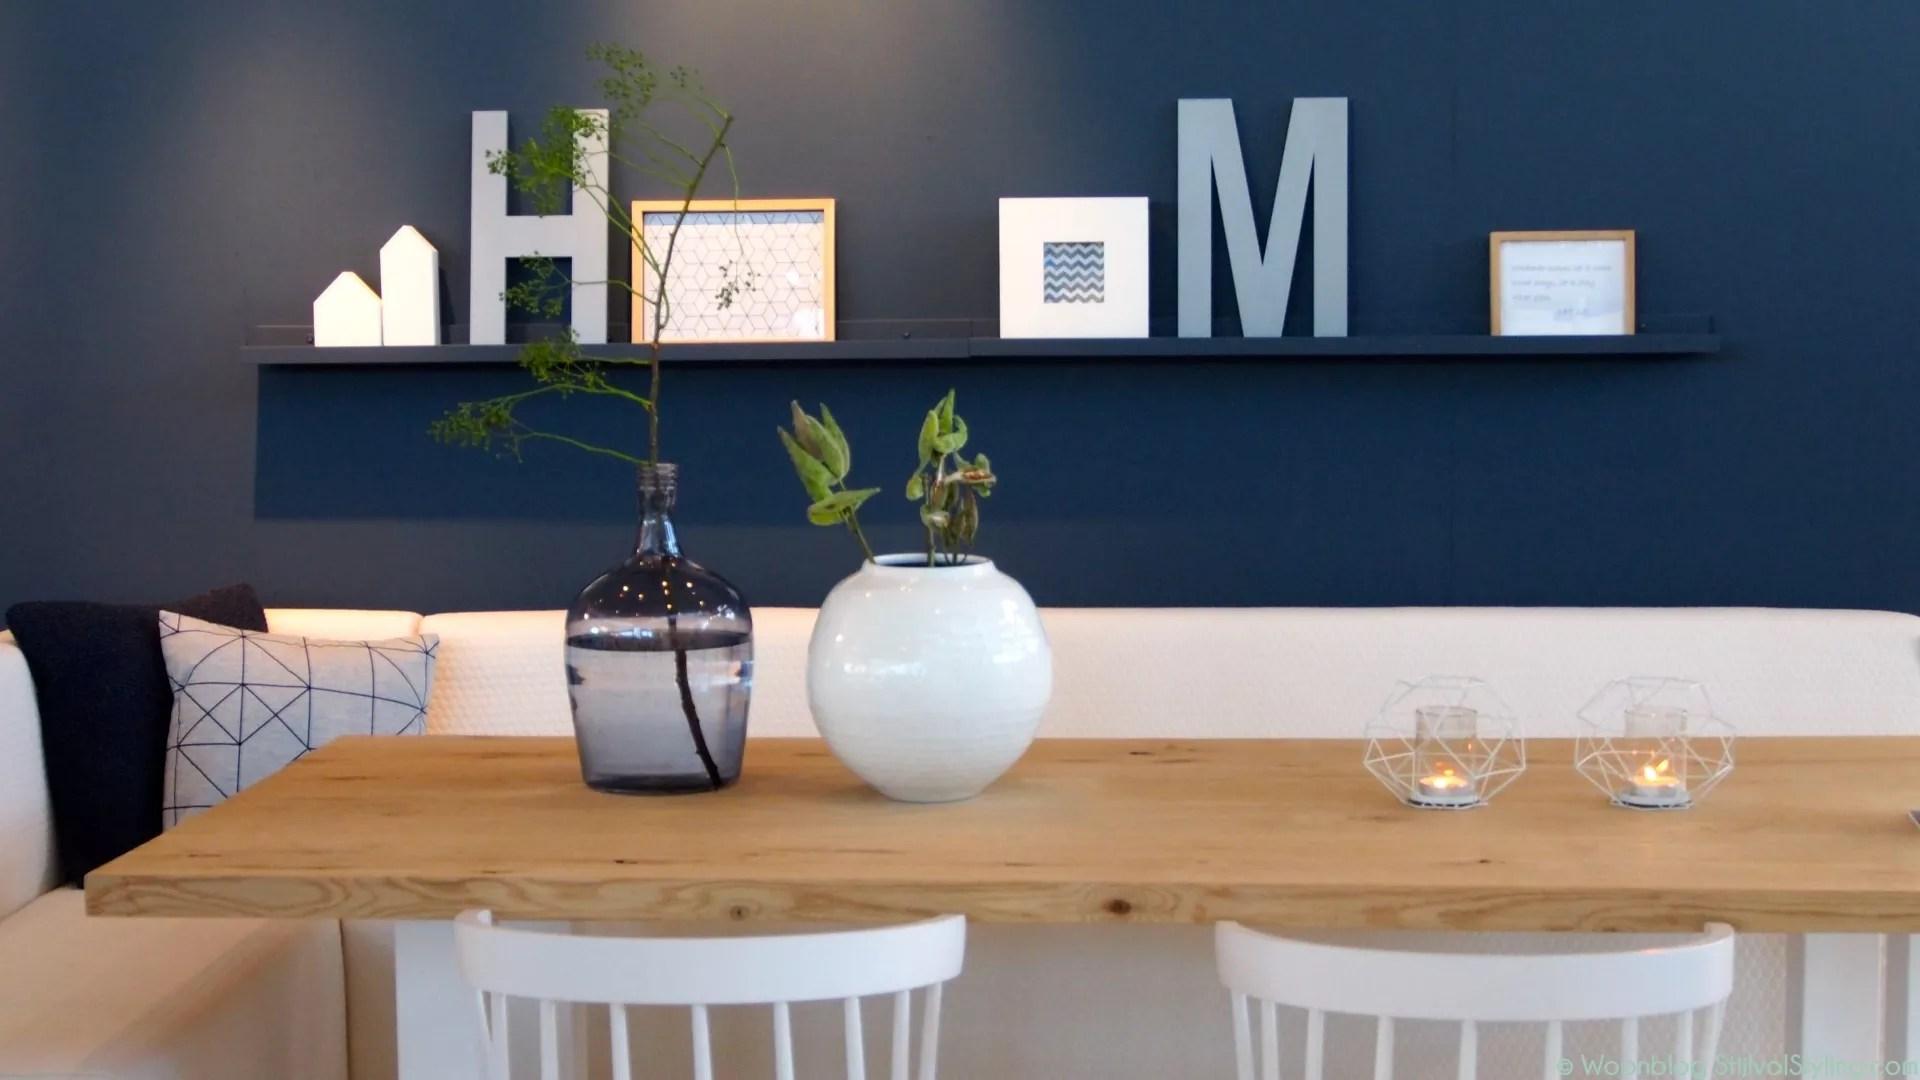 Interieur  Blue monday Interieur  kleur inspiratie met